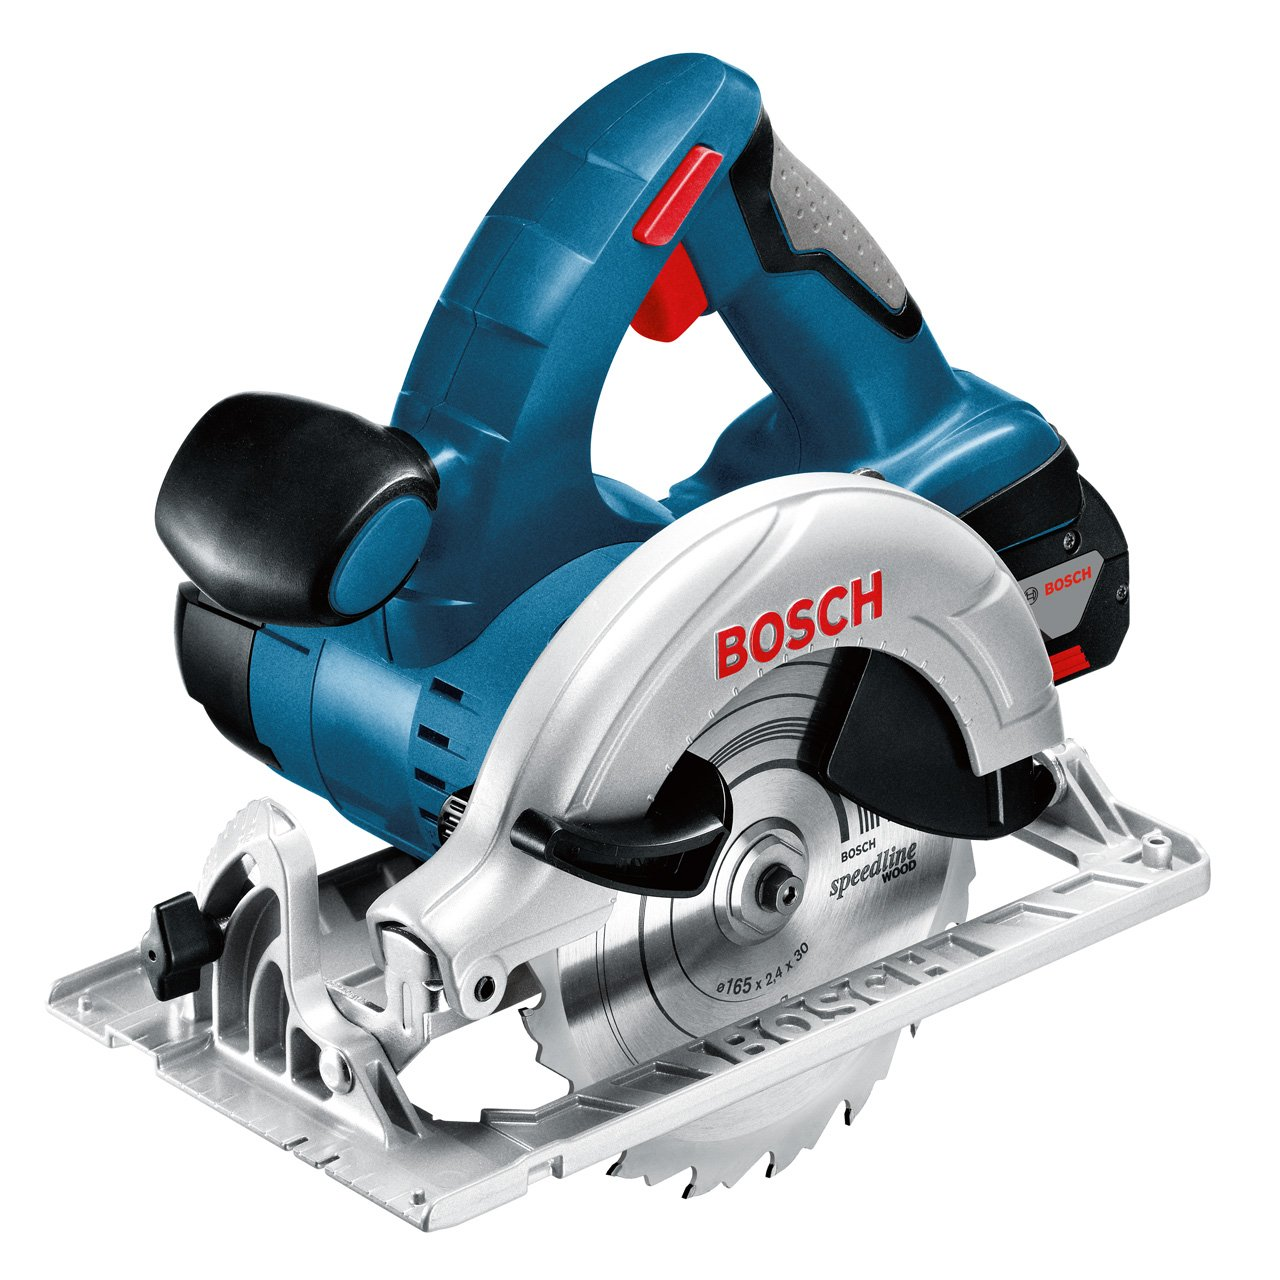 Bosch Professional 060166H008 Scie circulaire sans fil GKS 18 V-Li